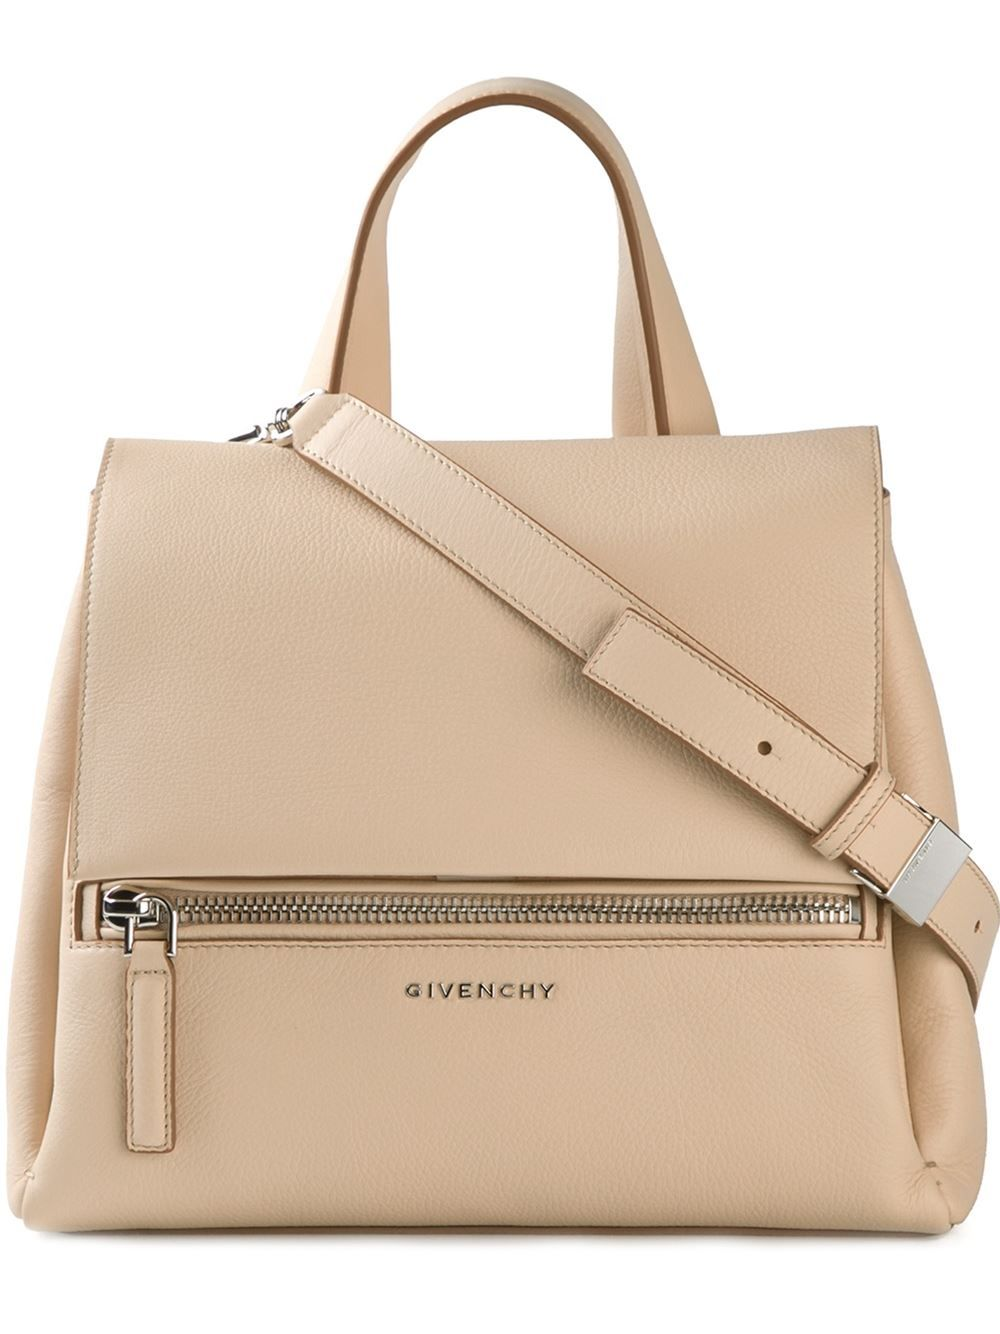 08f65b4895 givenchy  pandora  bag  tote  beige  fashion  newin www.jofre.eu ...